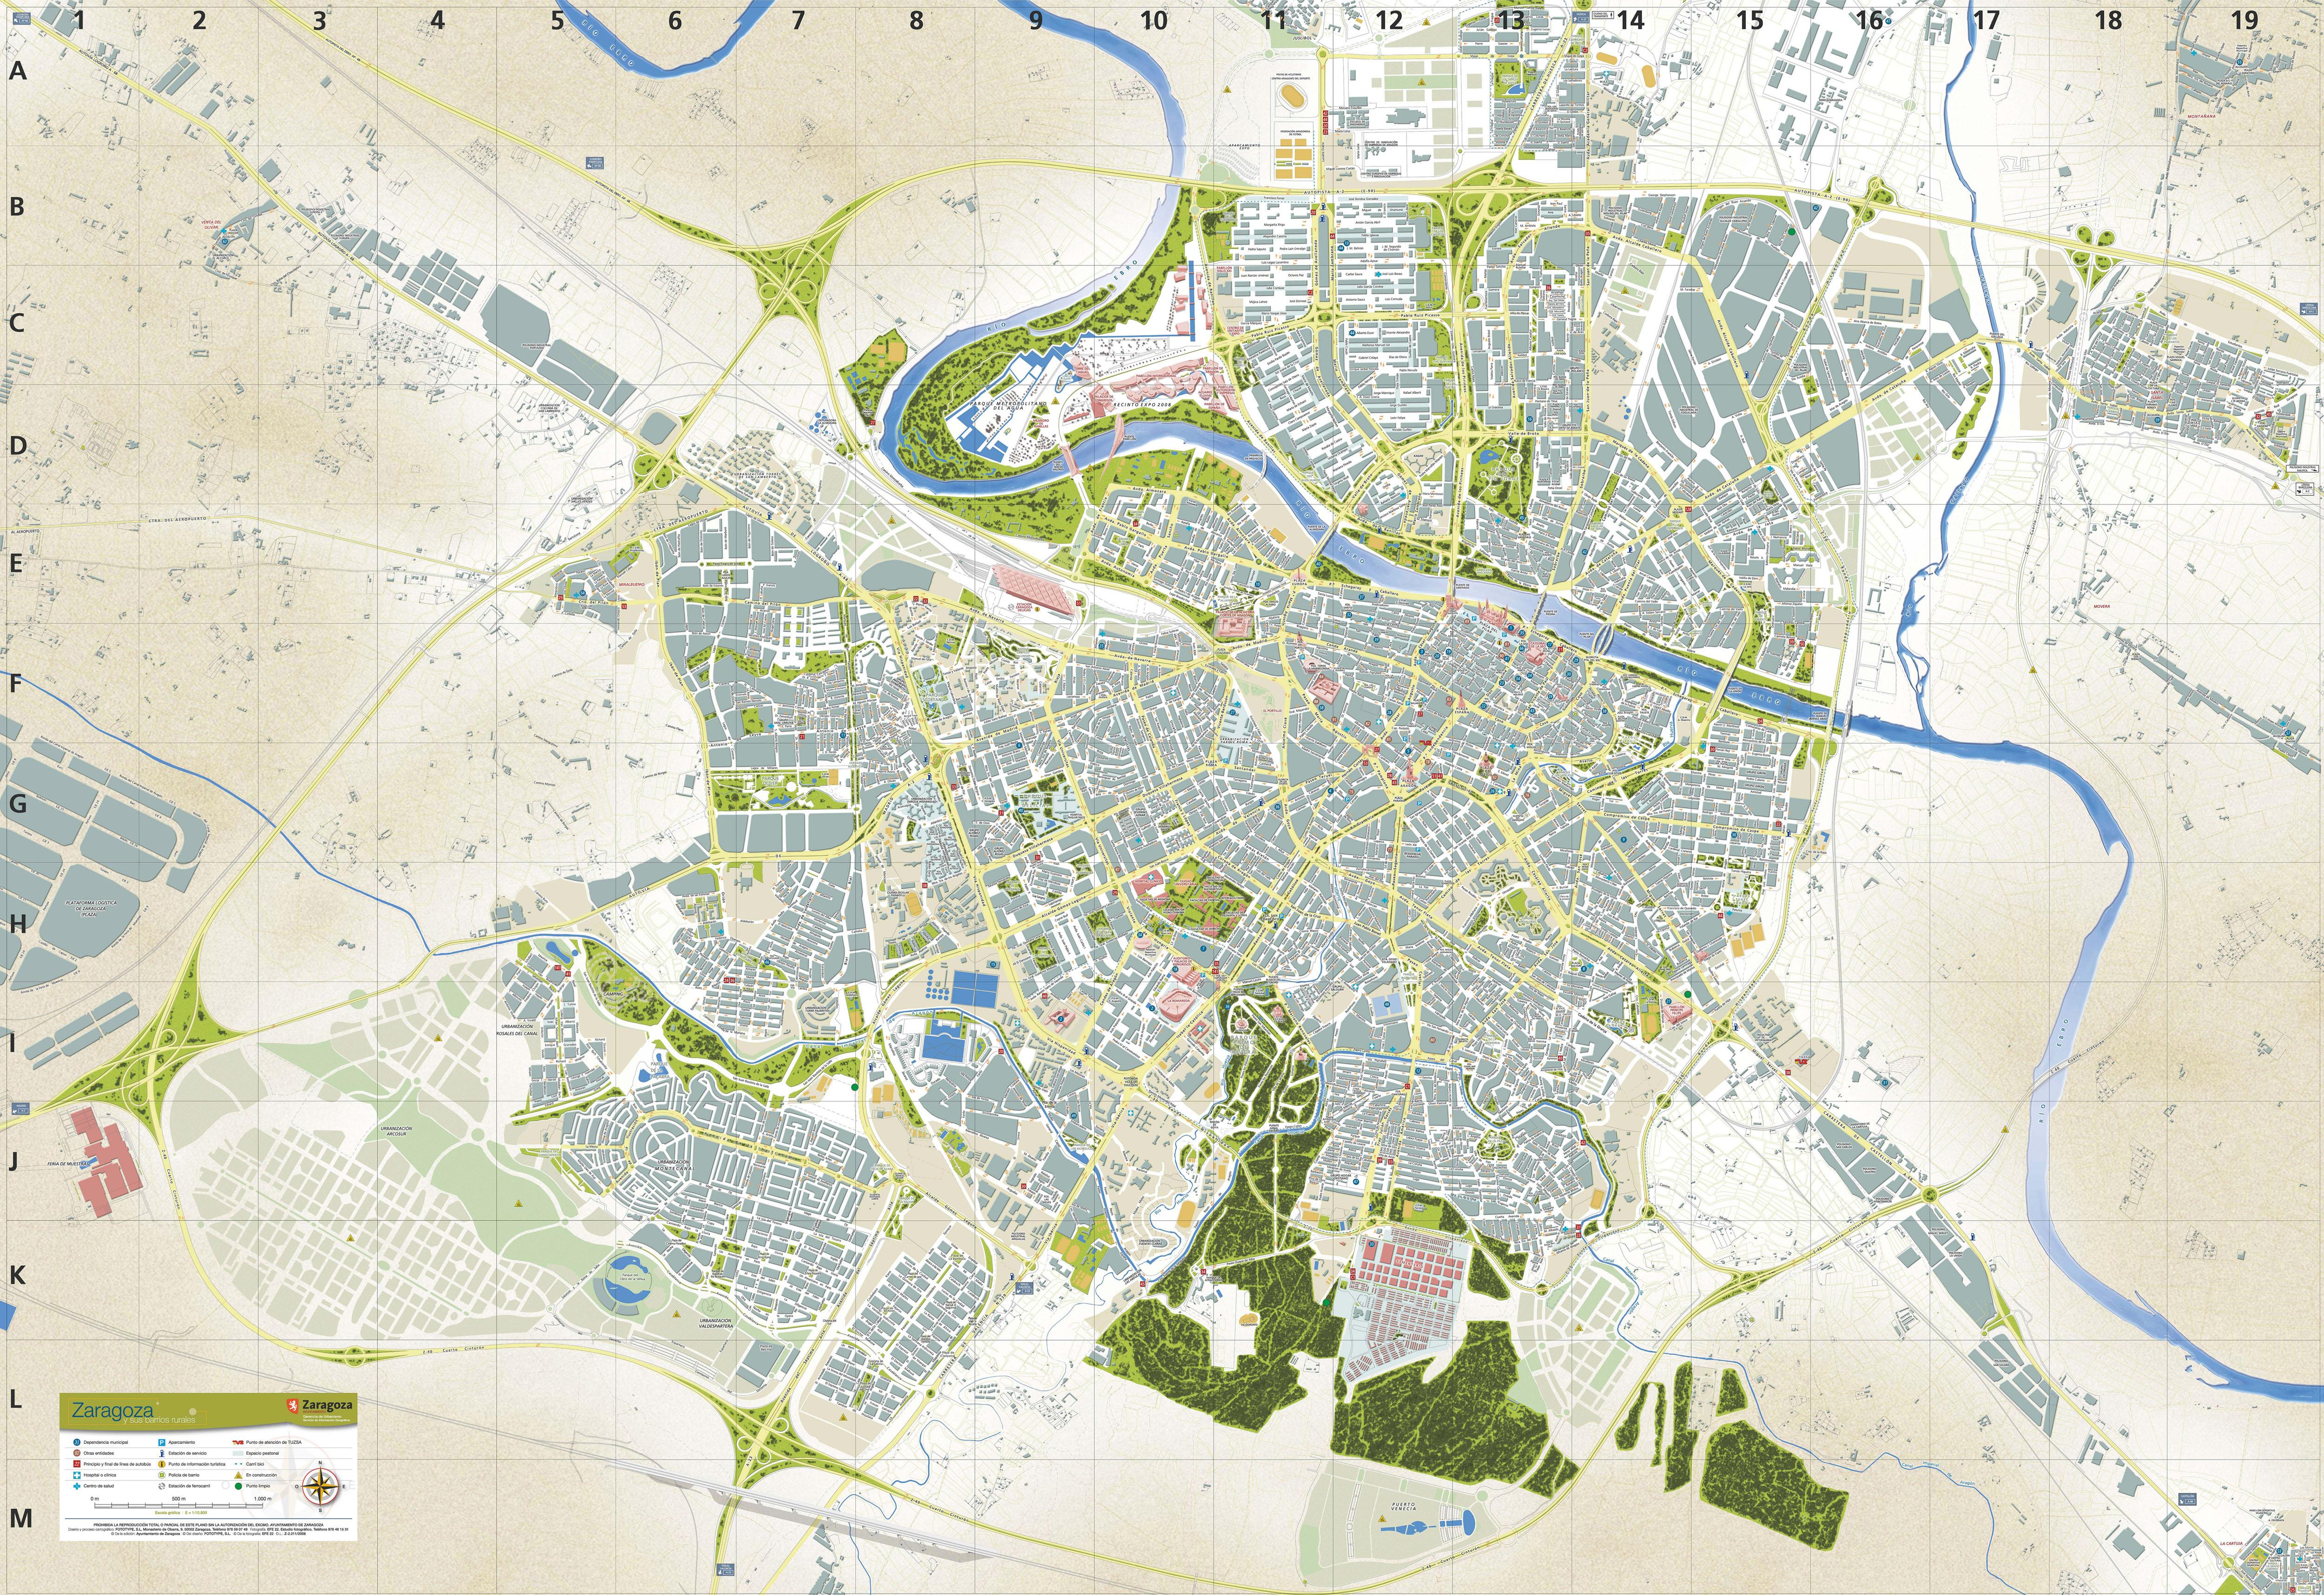 Mapa turístico de Zaragoza 2006